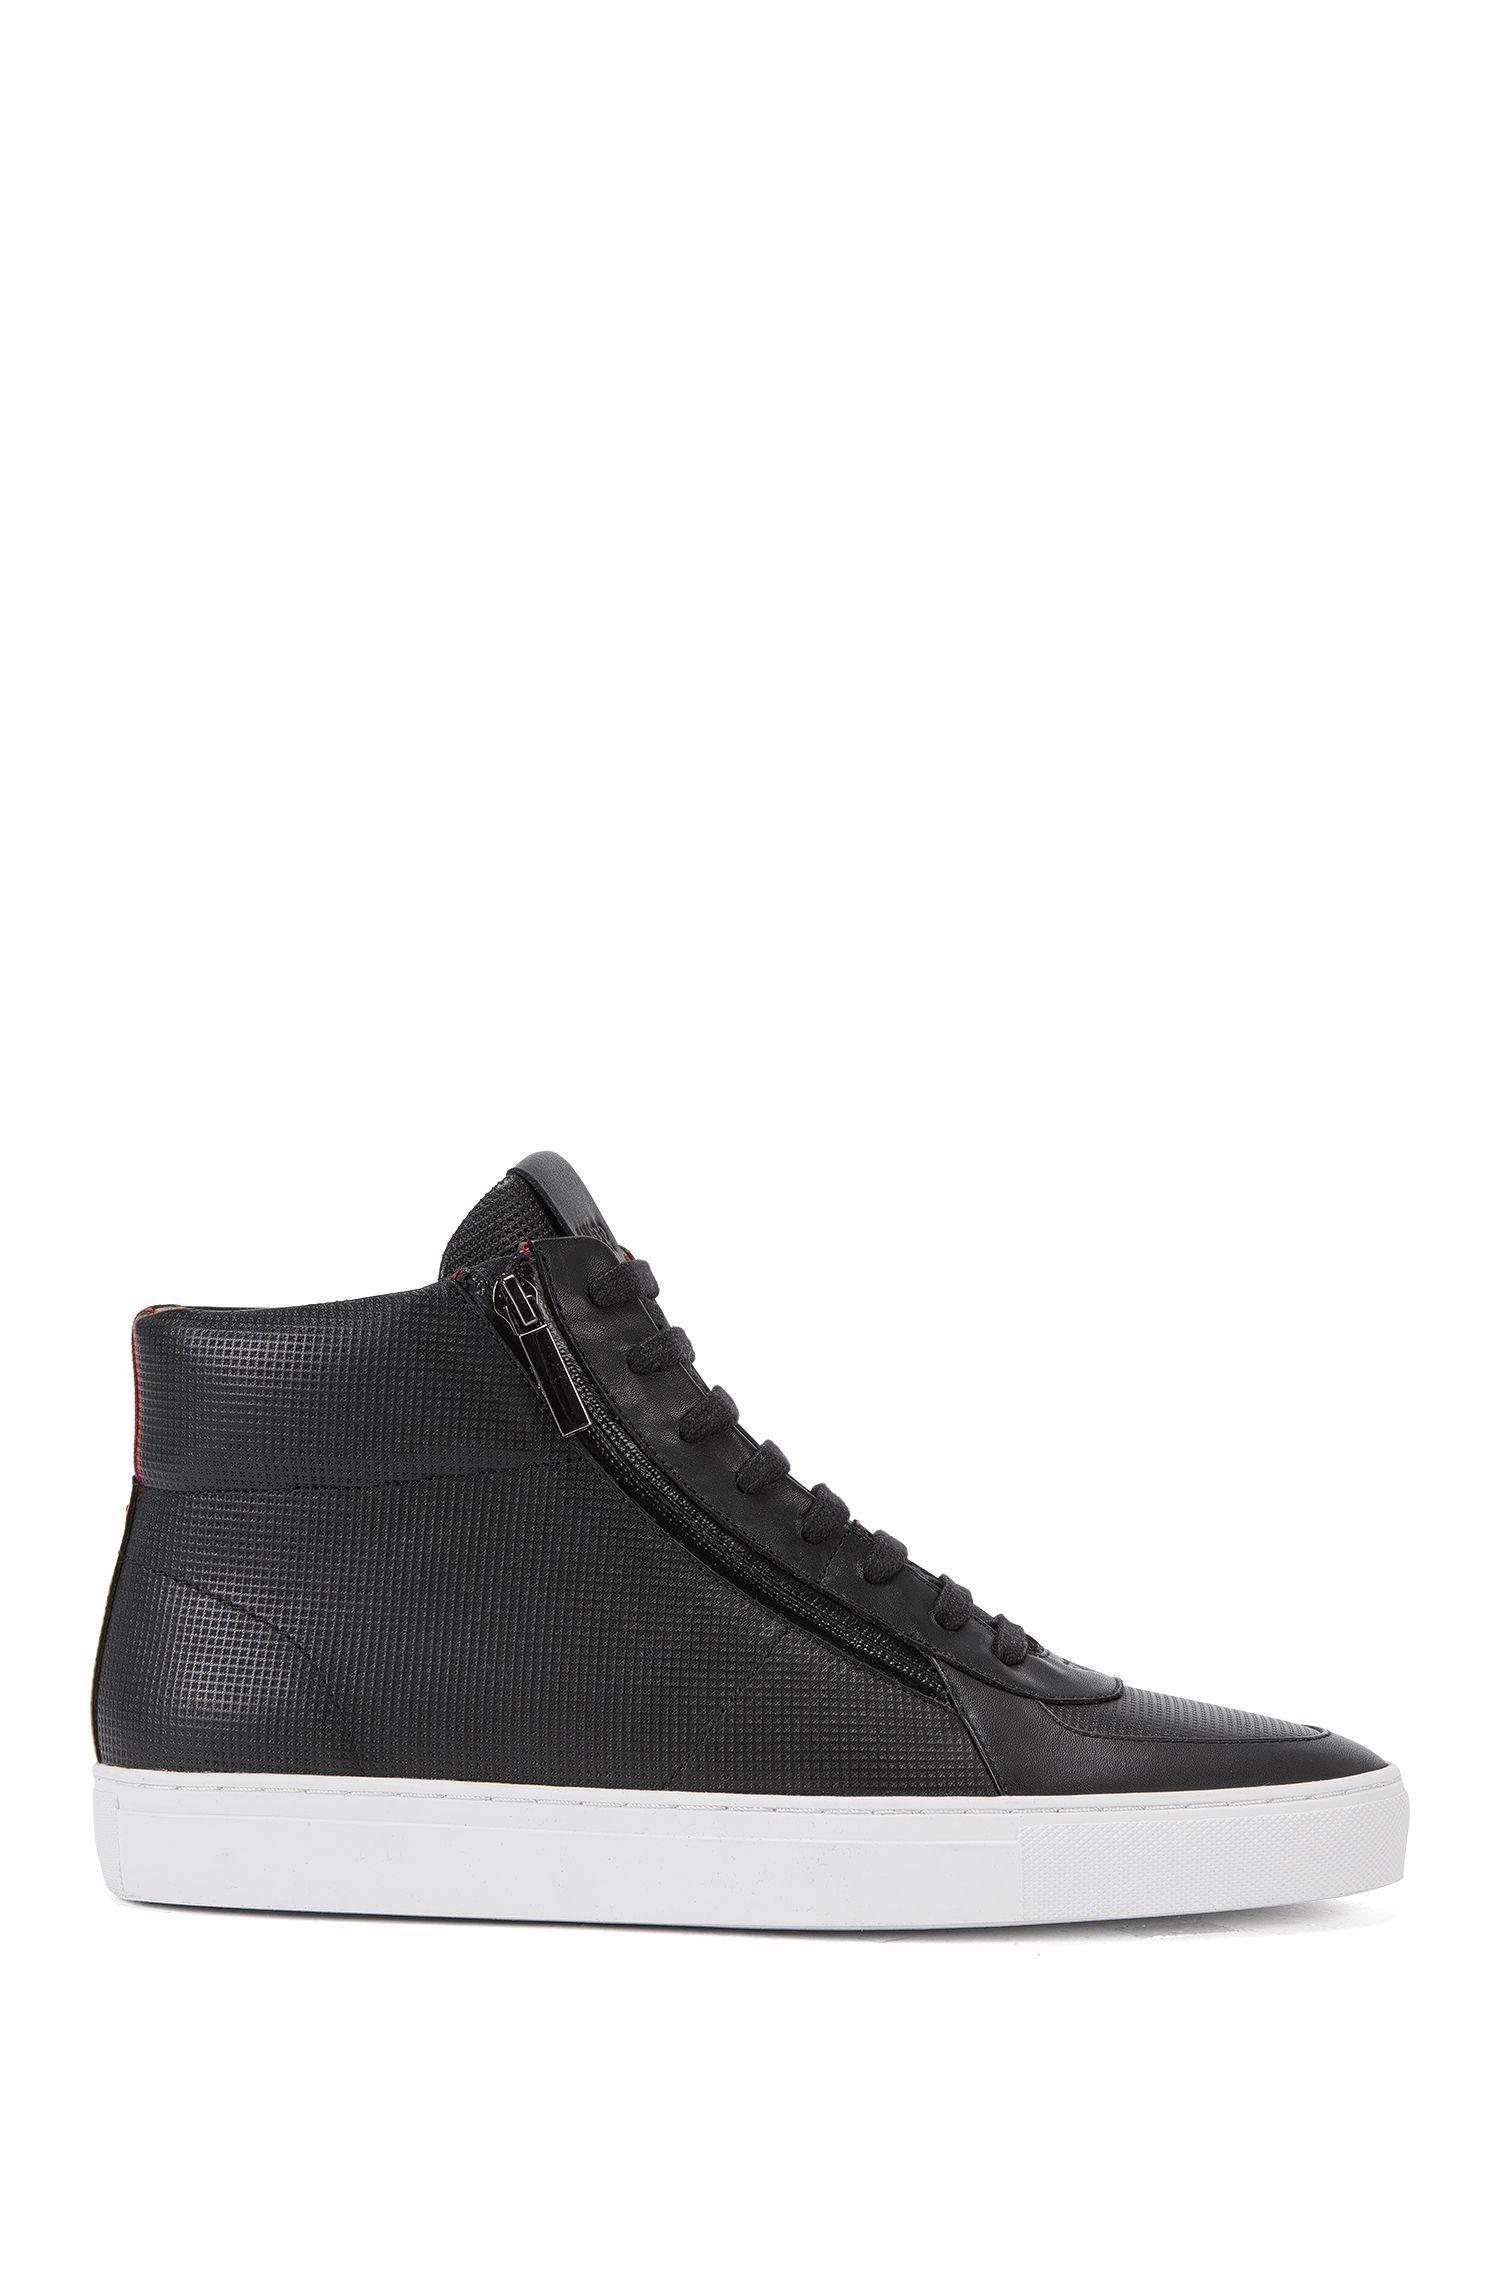 Leather High-Top Sneaker | Futurism Hito Itmtzp